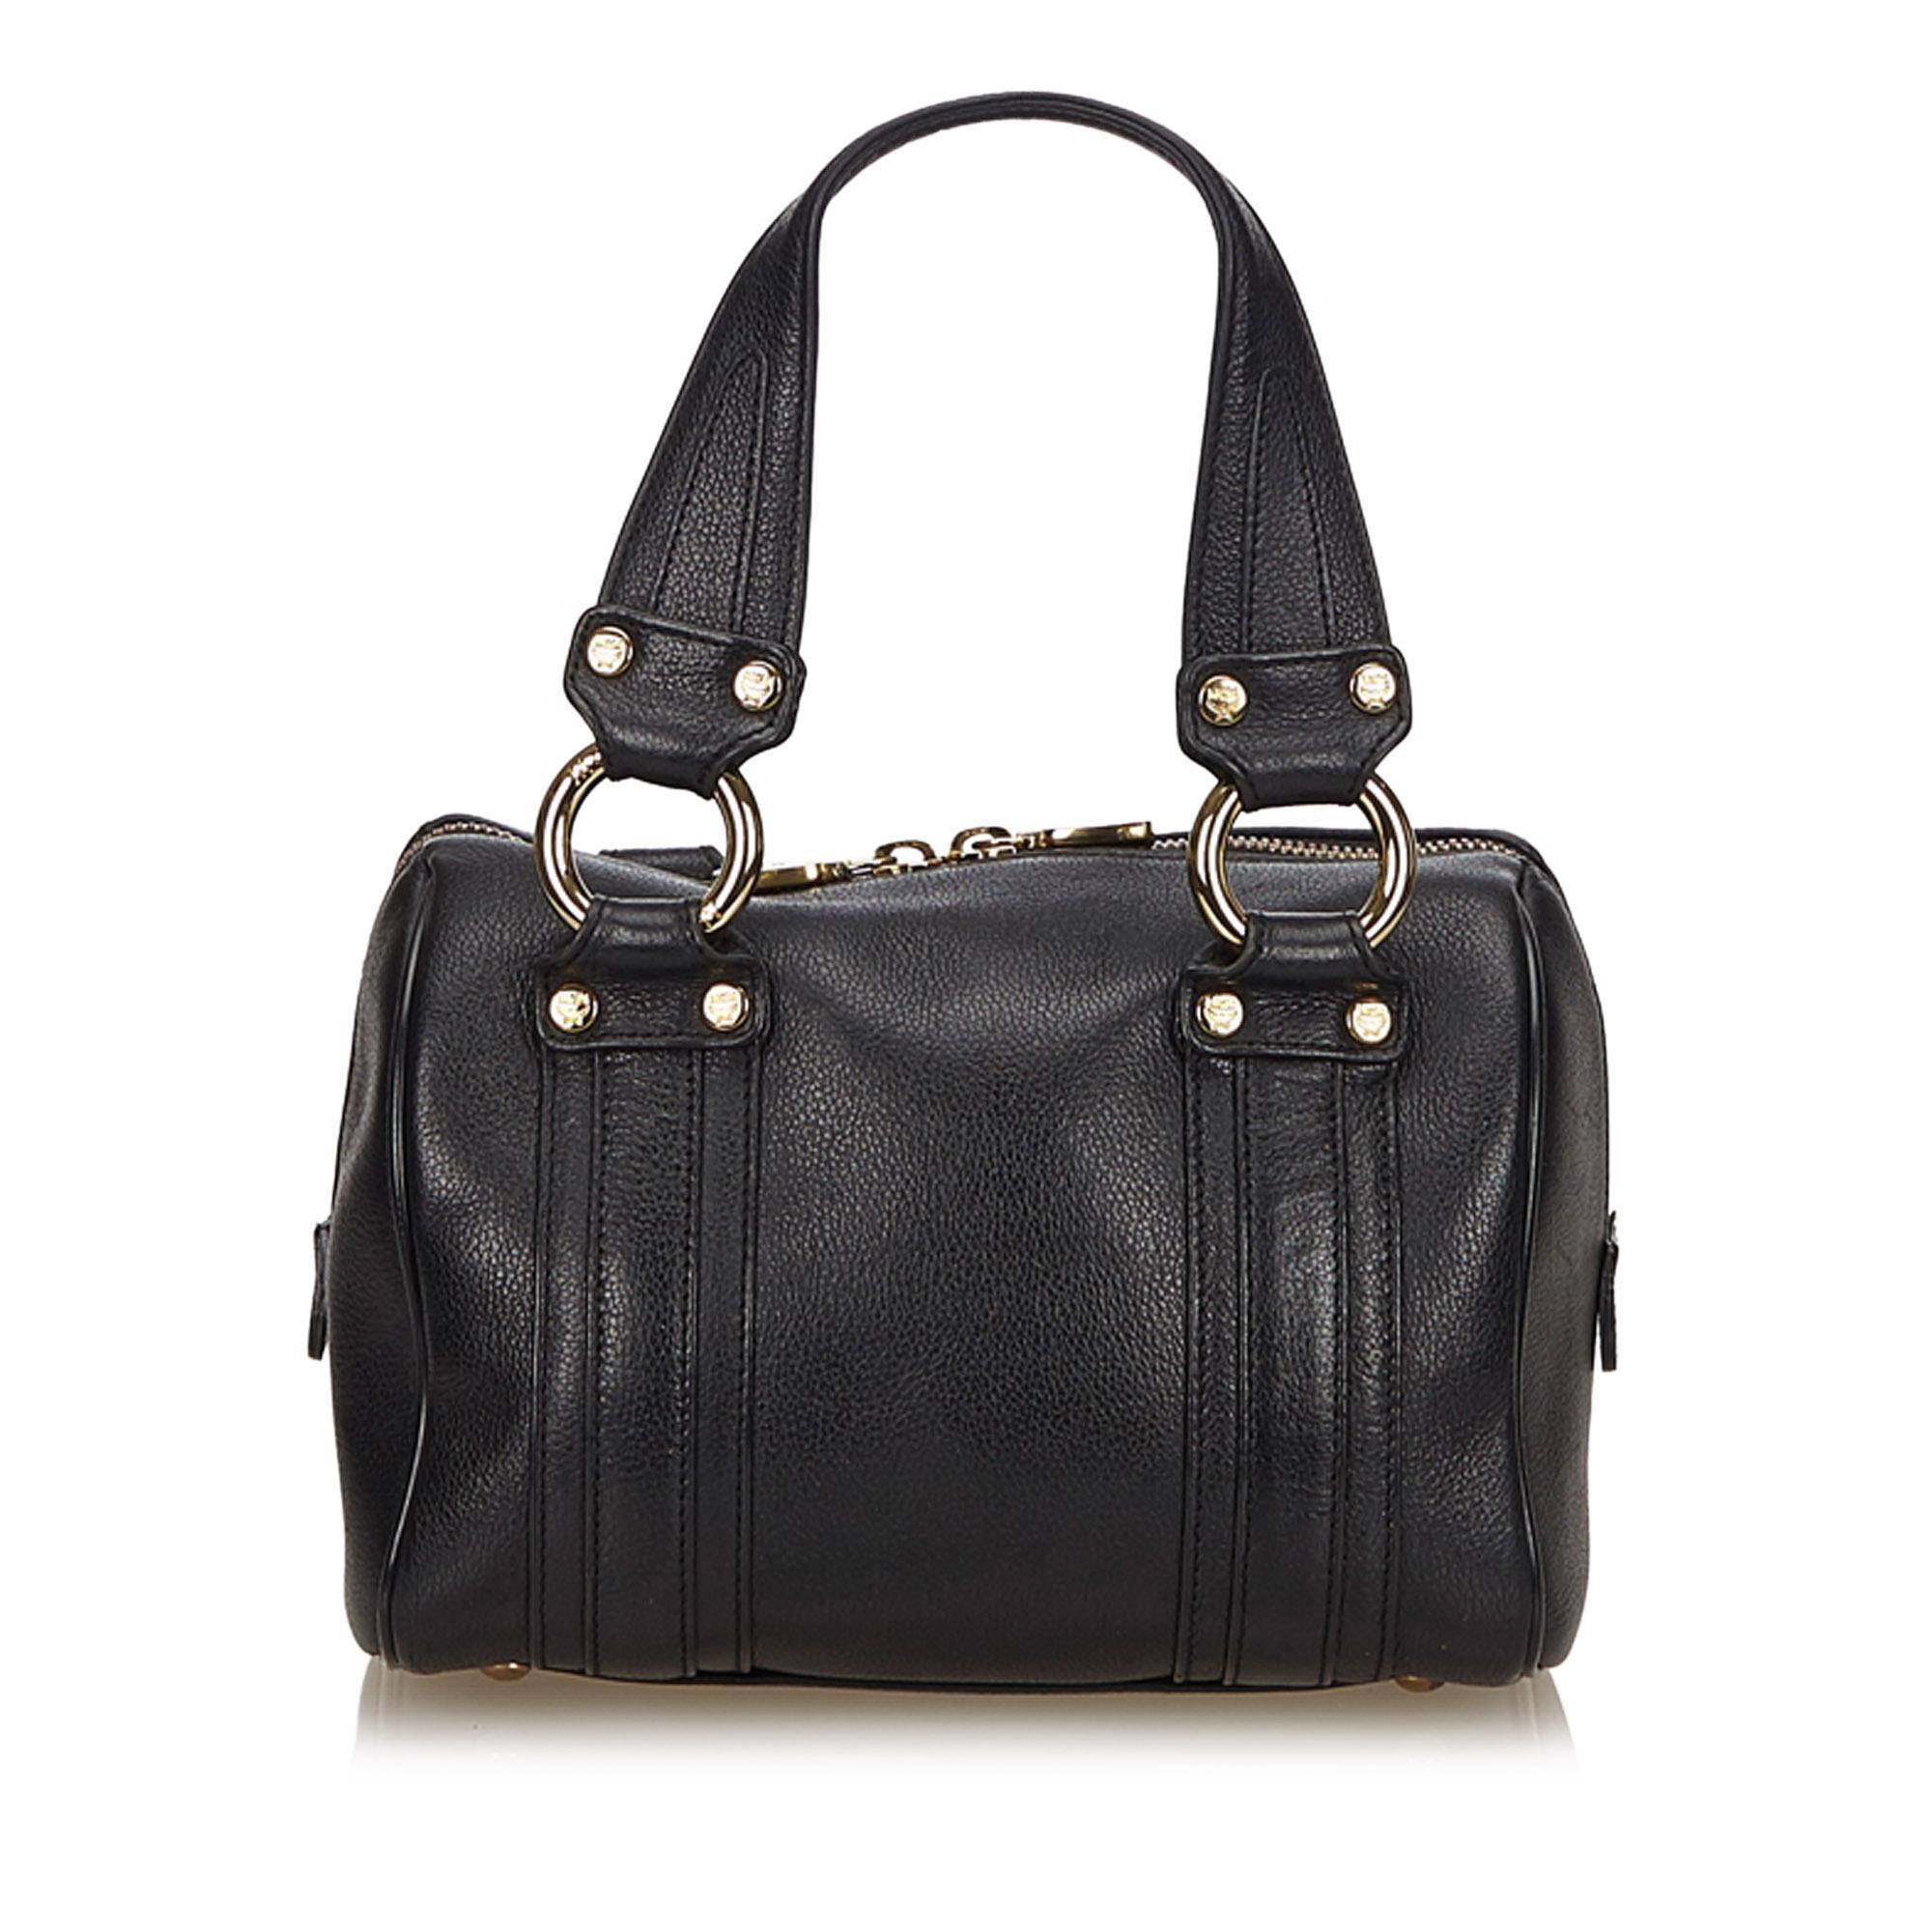 79d1b5b9b7 Black Studded Handbags Leather - Image Of Handbags Imageorp.co